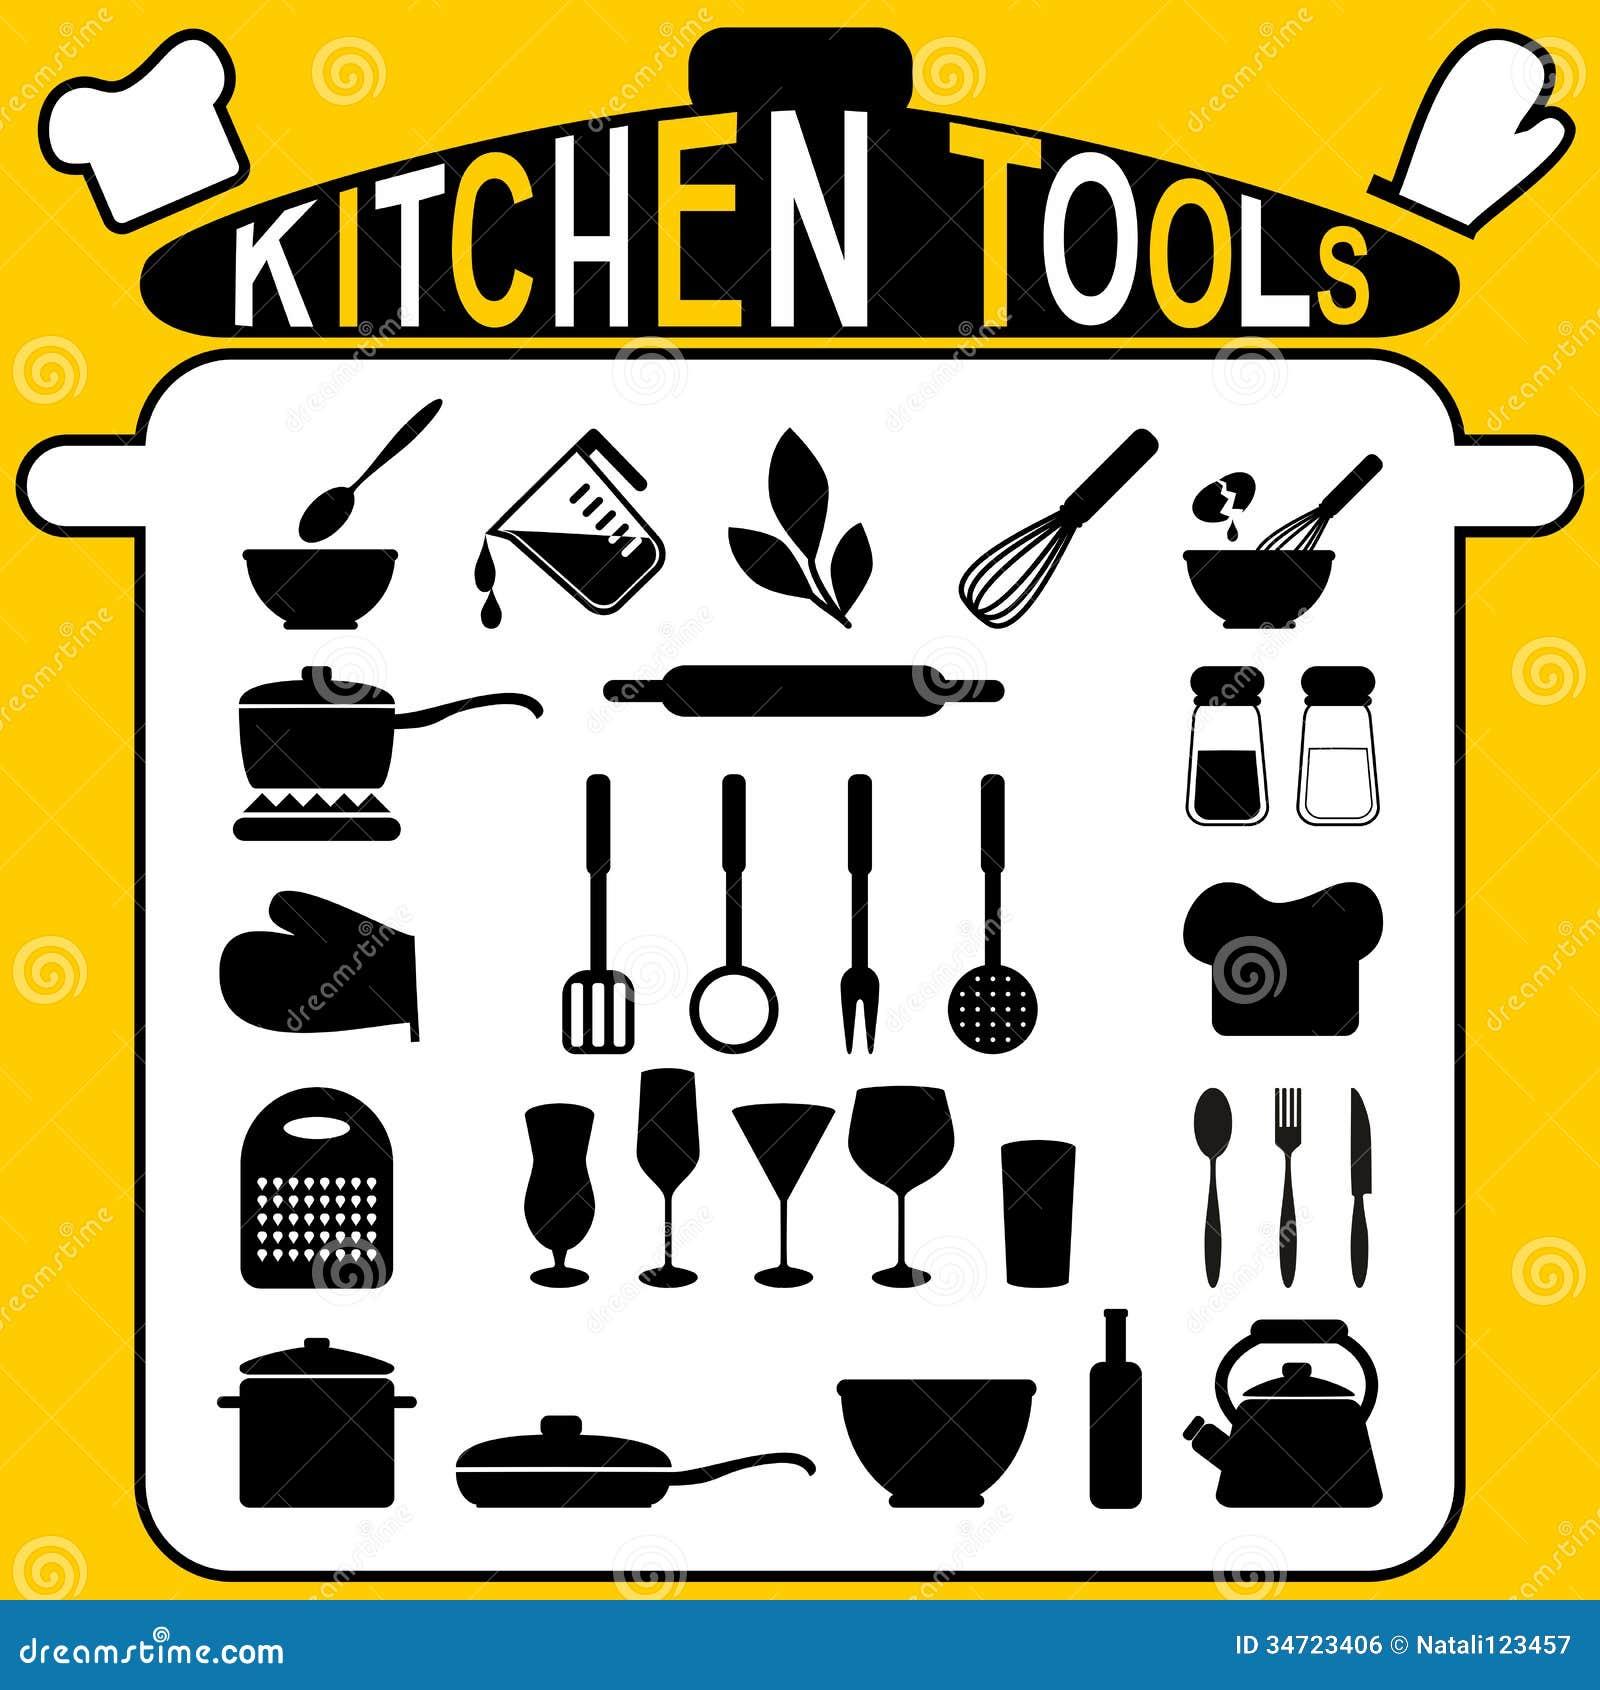 Kitchen Tools Icons Set Royalty Free Stock Image Image 34723406